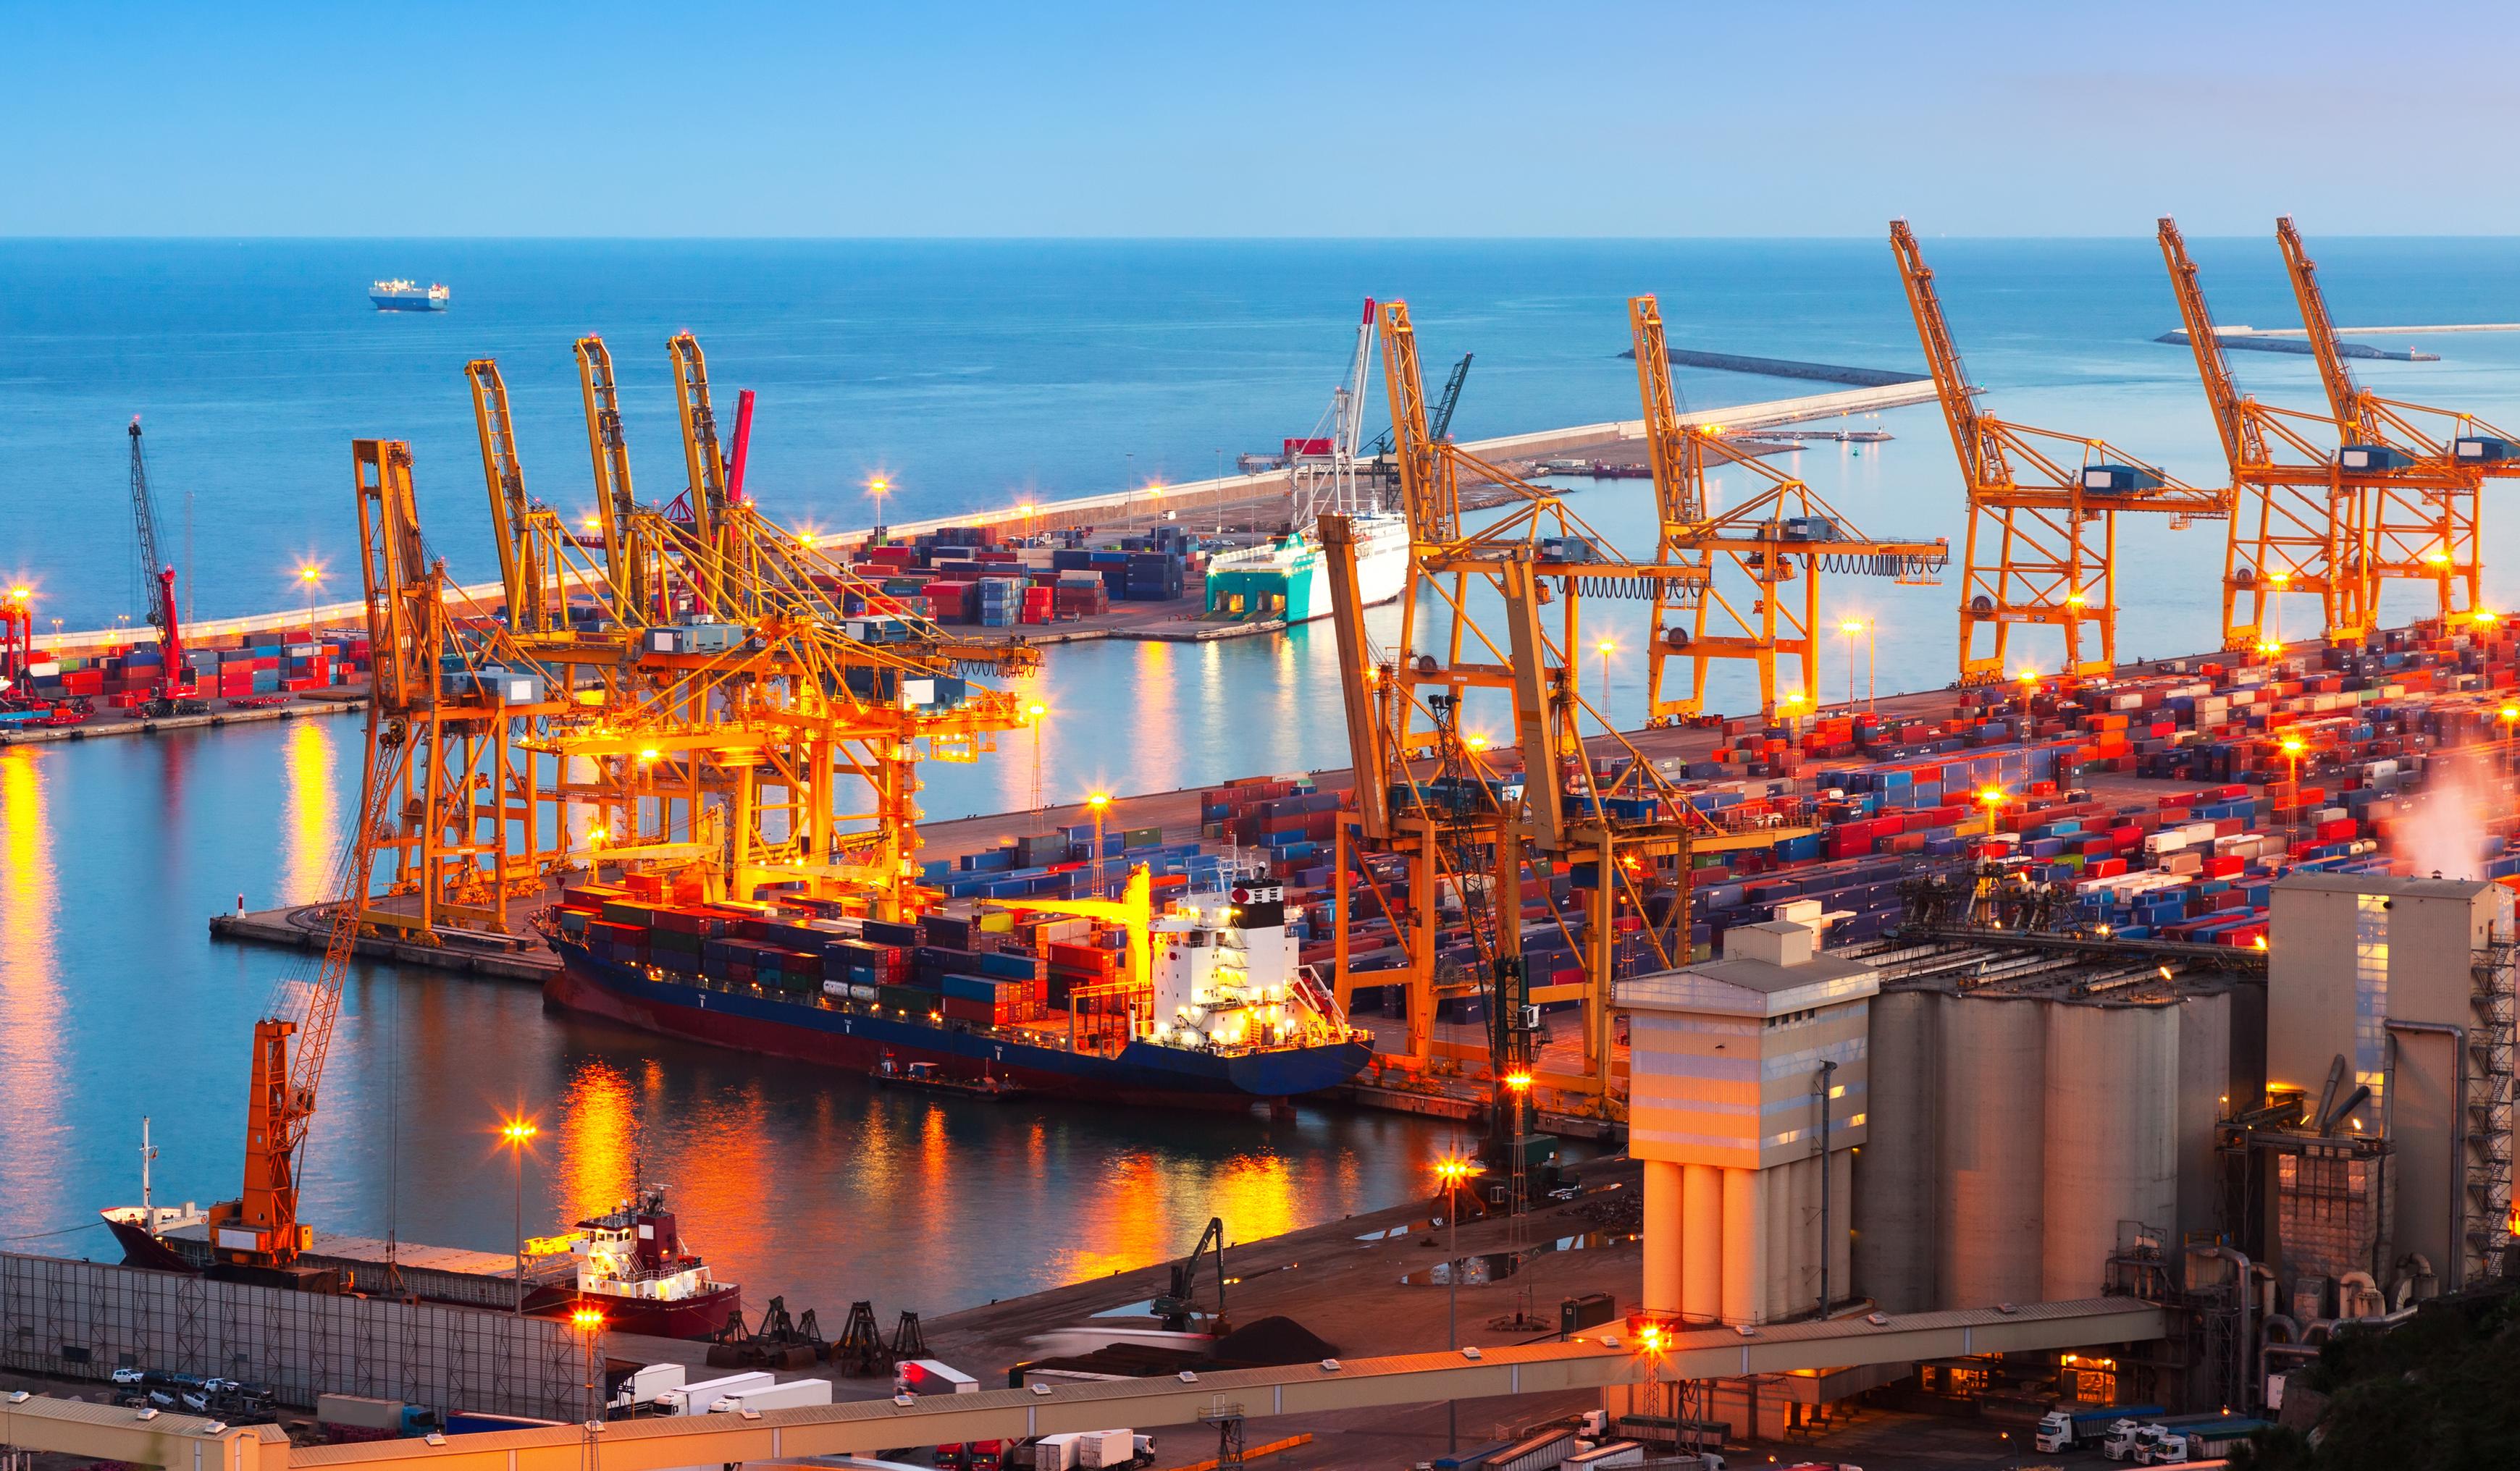 turk-ekonomi-bankasinin-ihracatcilara-destegi-suruyor